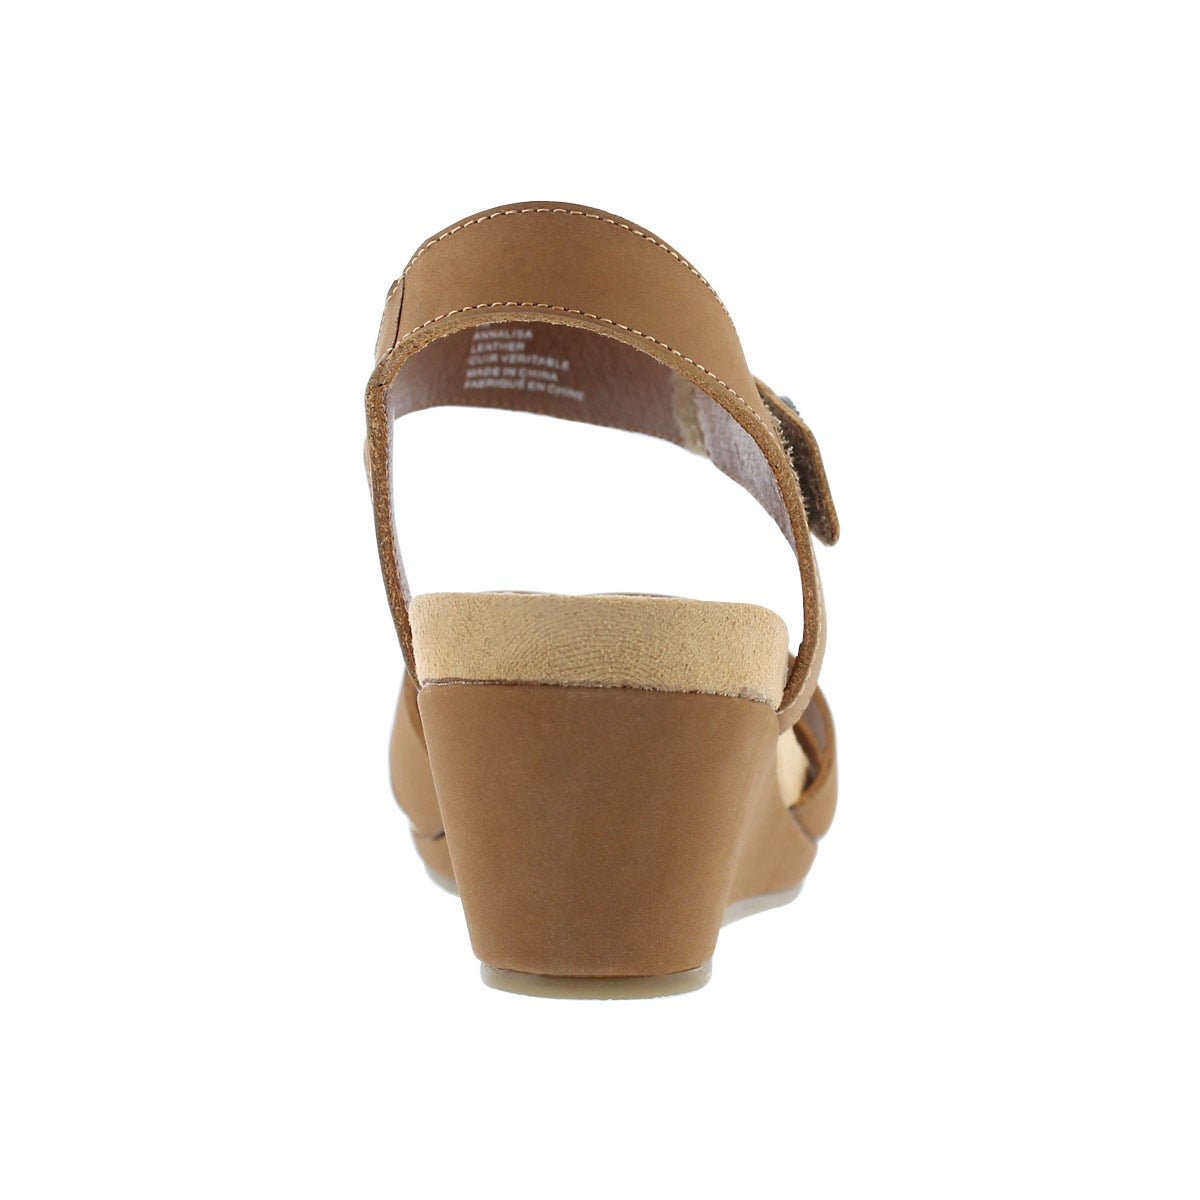 Lds Annalisa tan casual wedge sandal